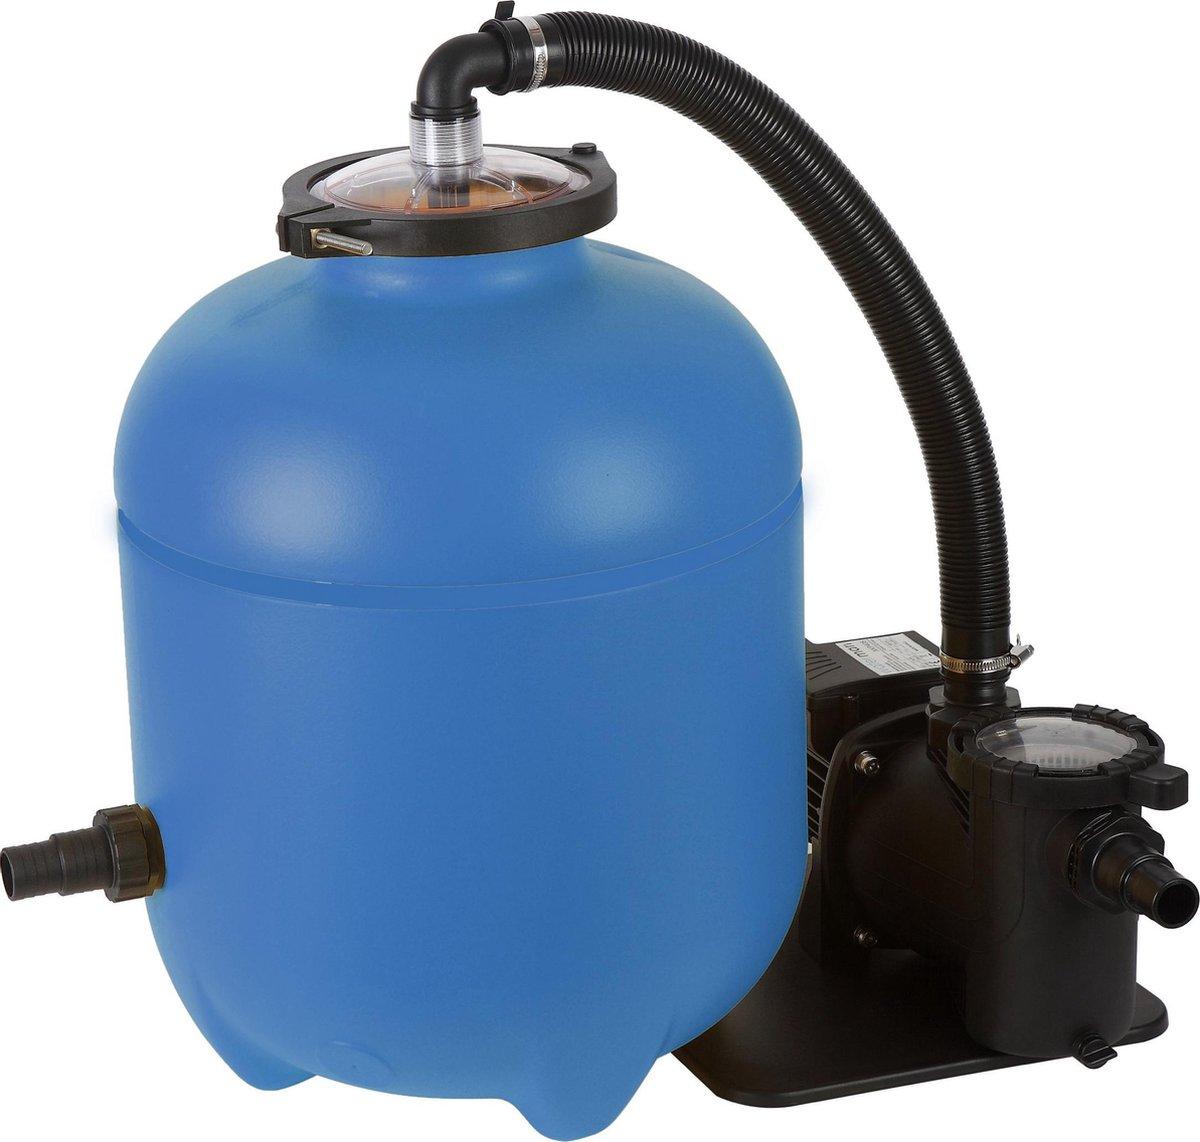 Blue bay filterpomp speedclean 10m³/u incl. polysphere - zwembad filterpomp (Nieuw)